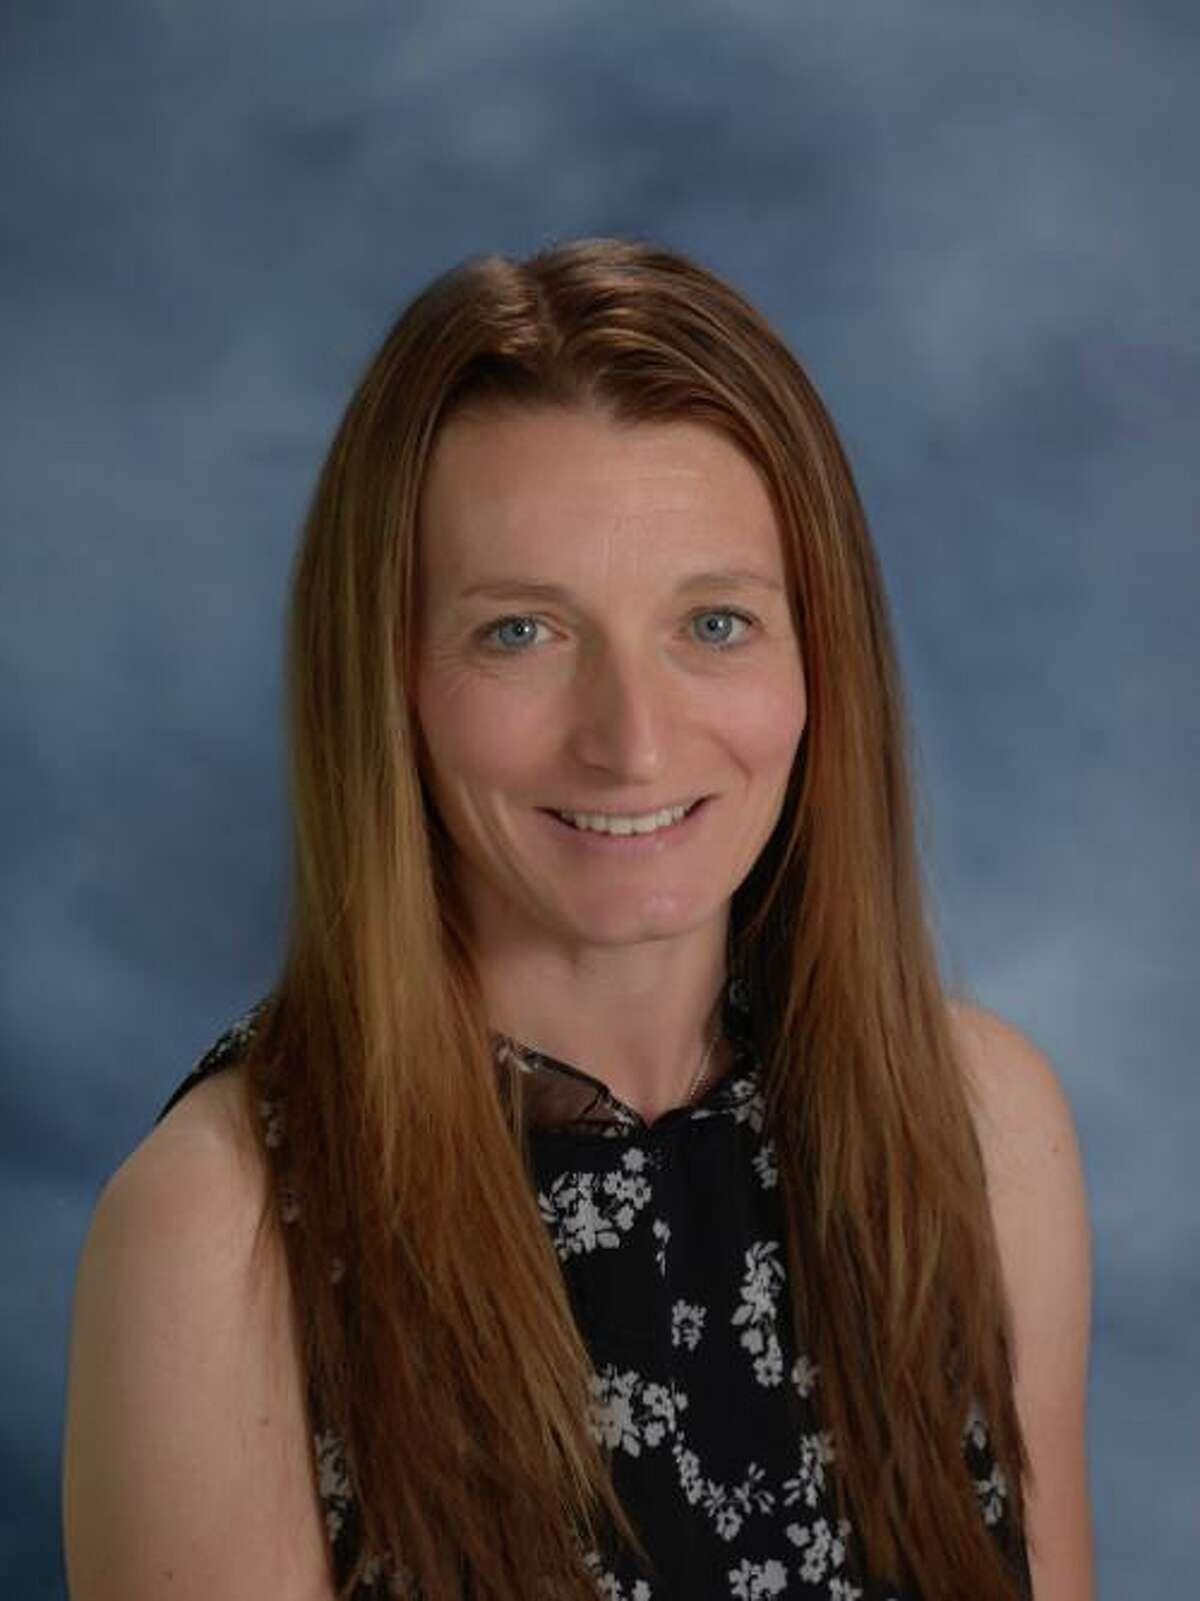 Tracey Carbone, principal at Kings Highway Elementary School